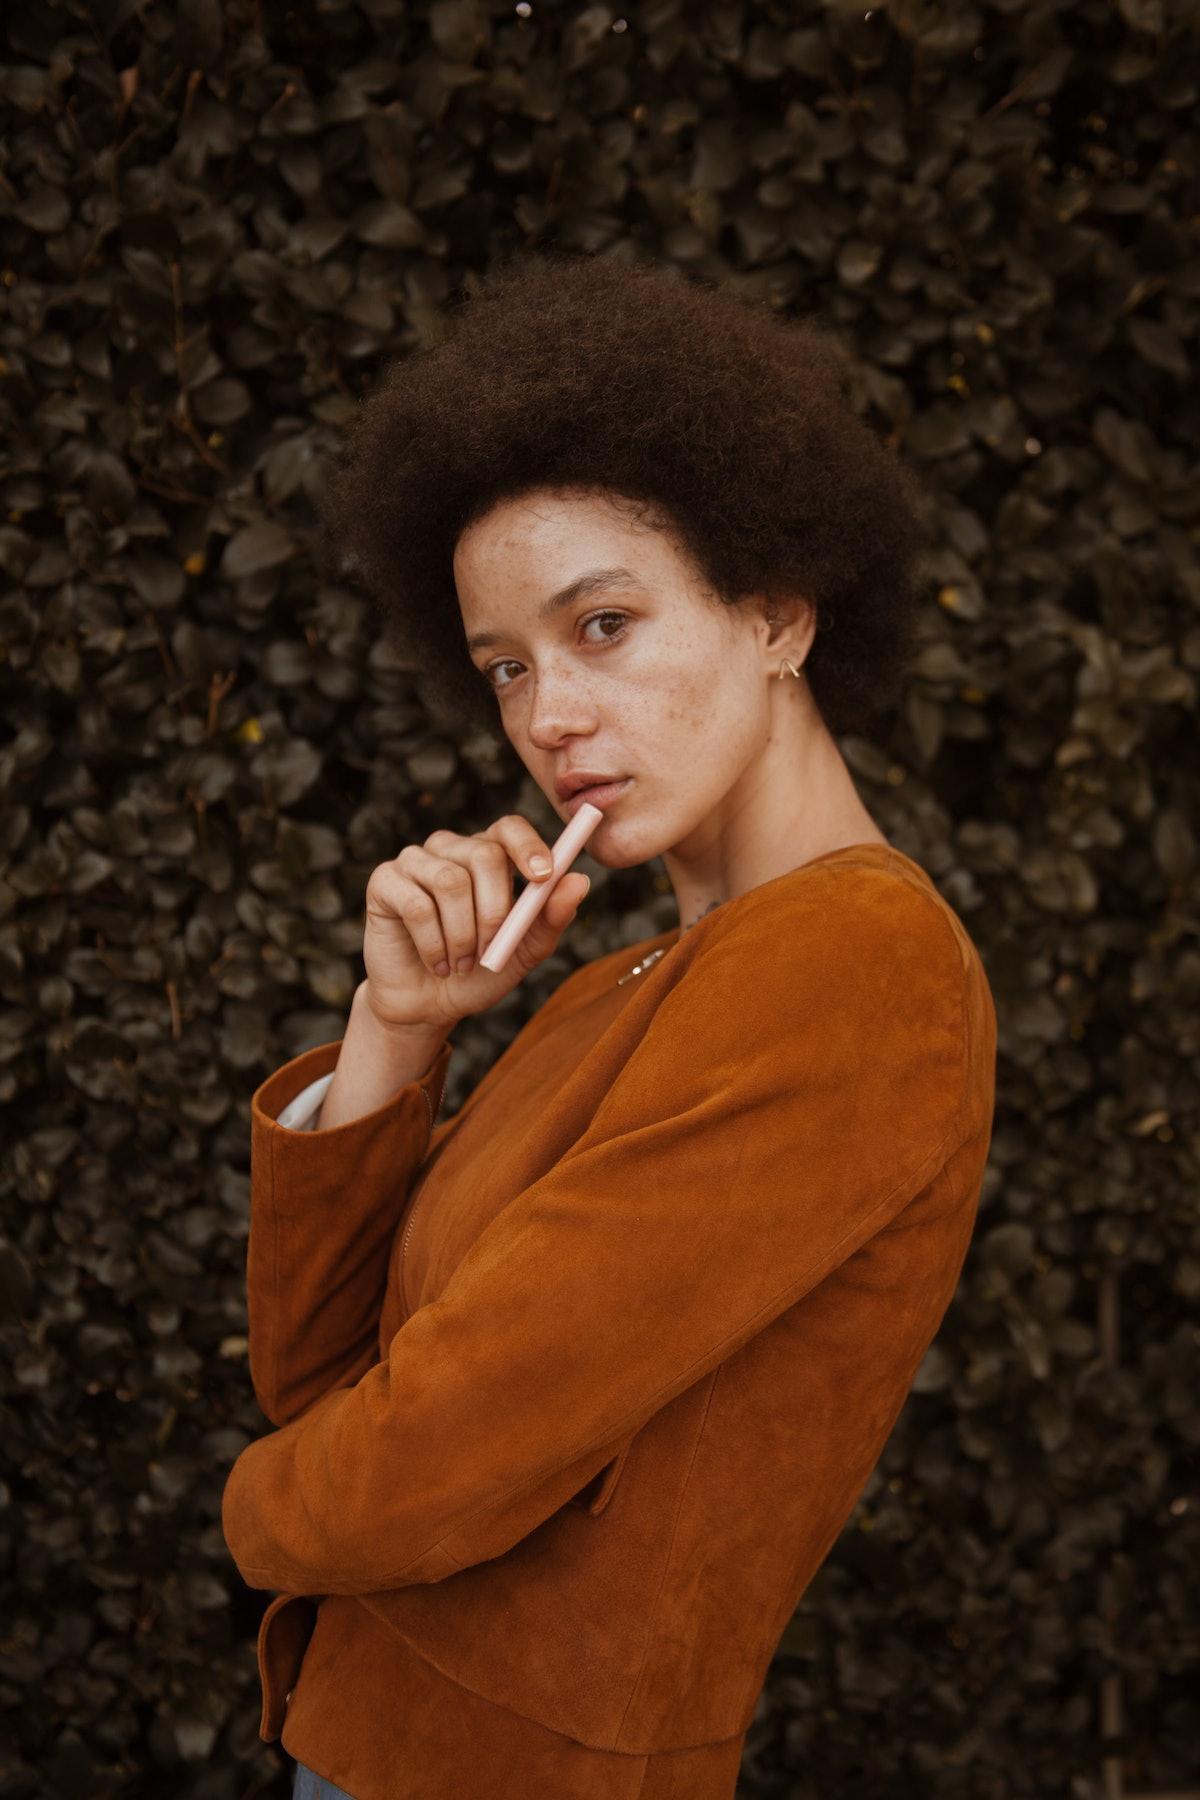 Miss Grass/Cannabis